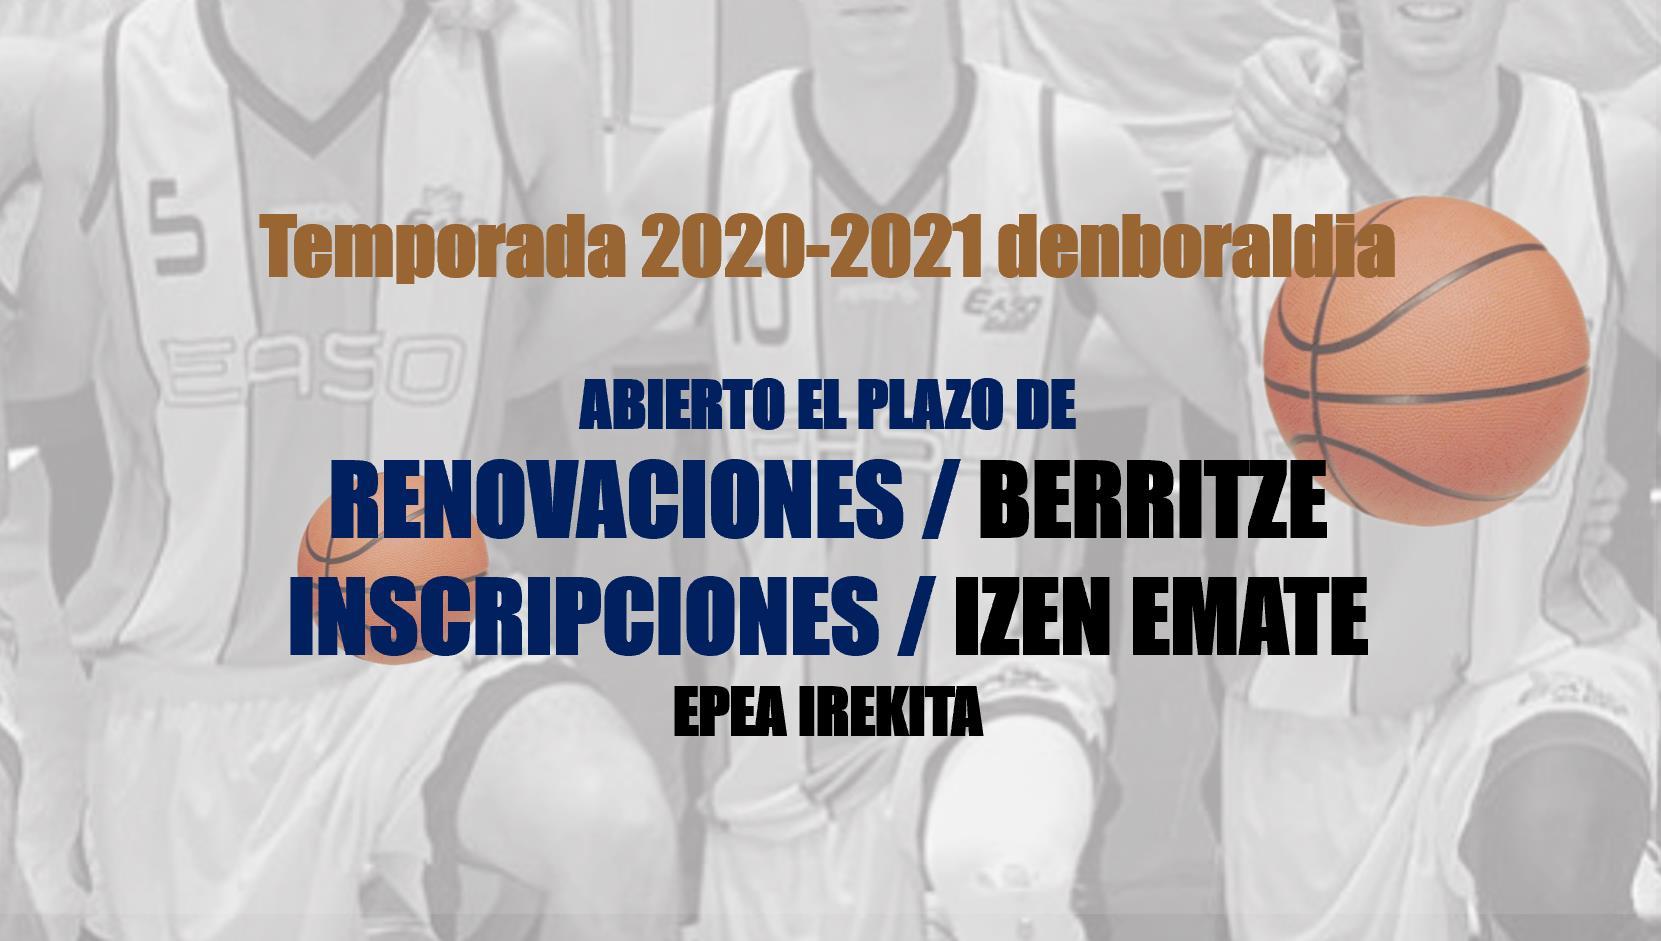 INSCRIPCIONES / RENOVACIONES TEMPORADA 2020/2021